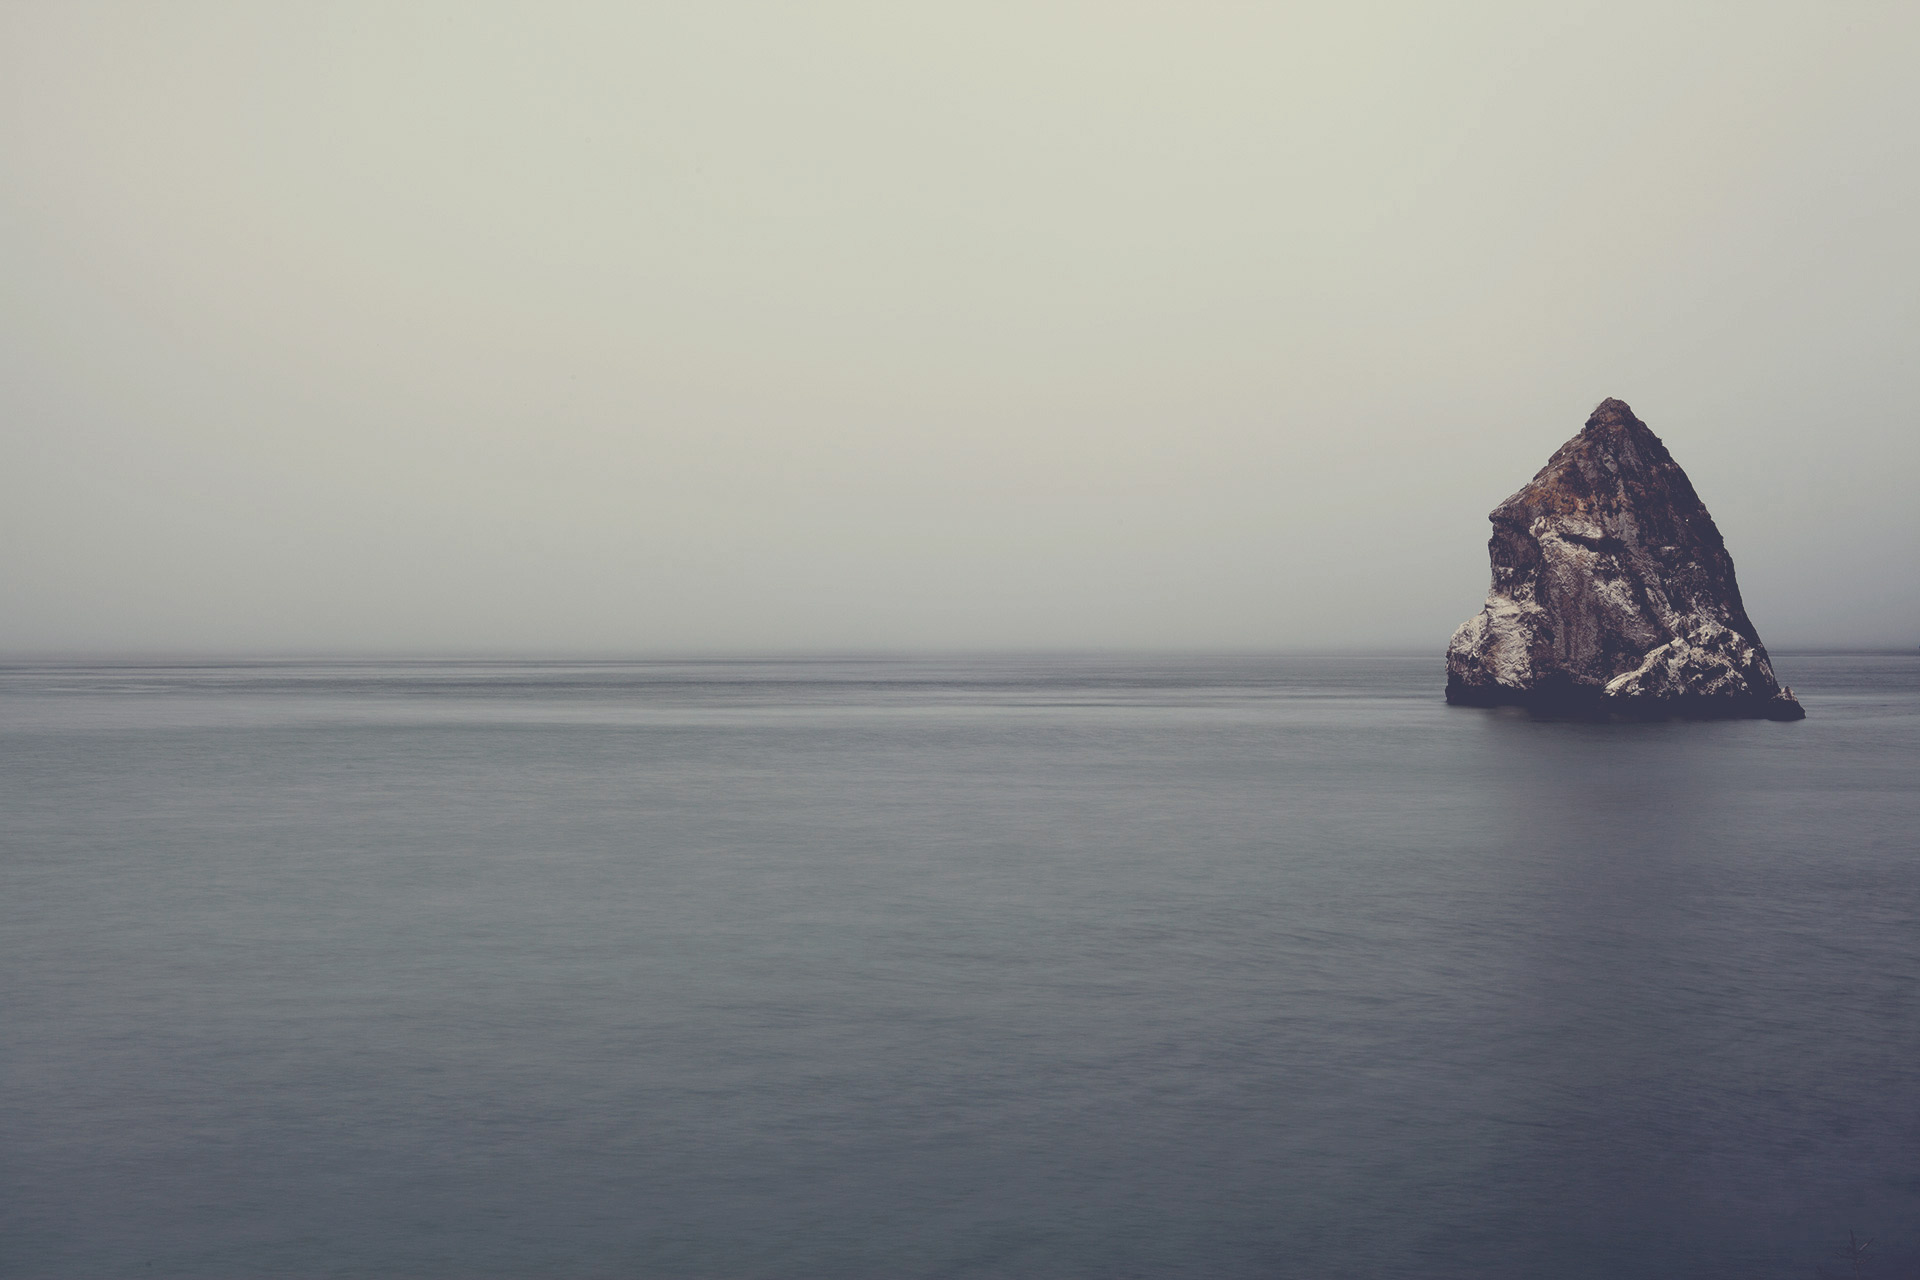 Rock in the middle of the ocean, cliff, rock, rock, island, ocean, sea, water, rock, sky, landscape, nature